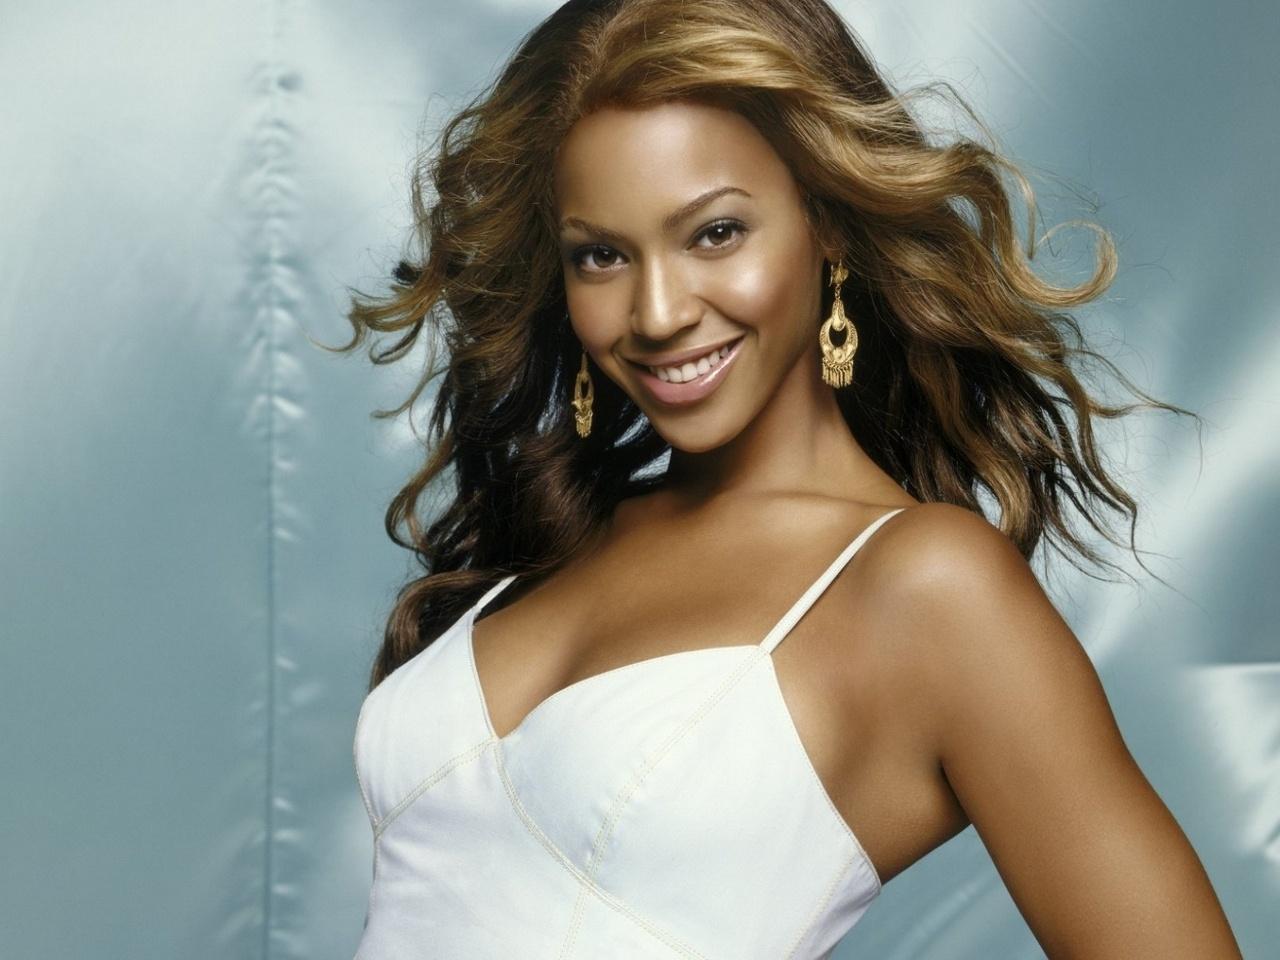 Beyoncé Just A Girl From Houston - Canyon News Beyonce